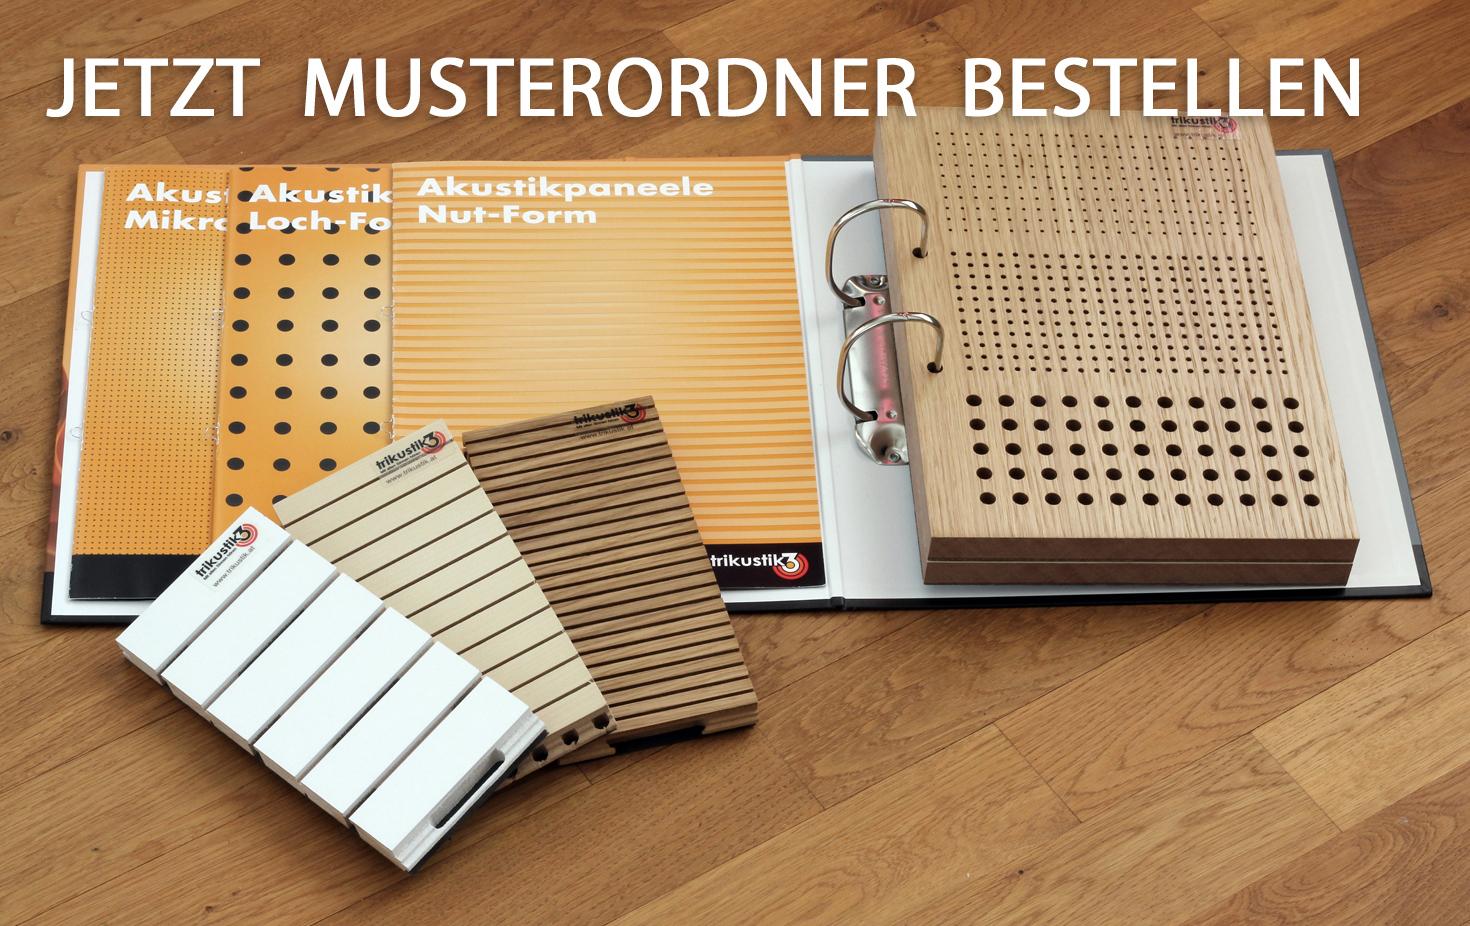 Diverse Wandverkleidung Holz ~ Akustikplatten Wand Akustikdecke & Lochplatten, Paneele  Trikustik